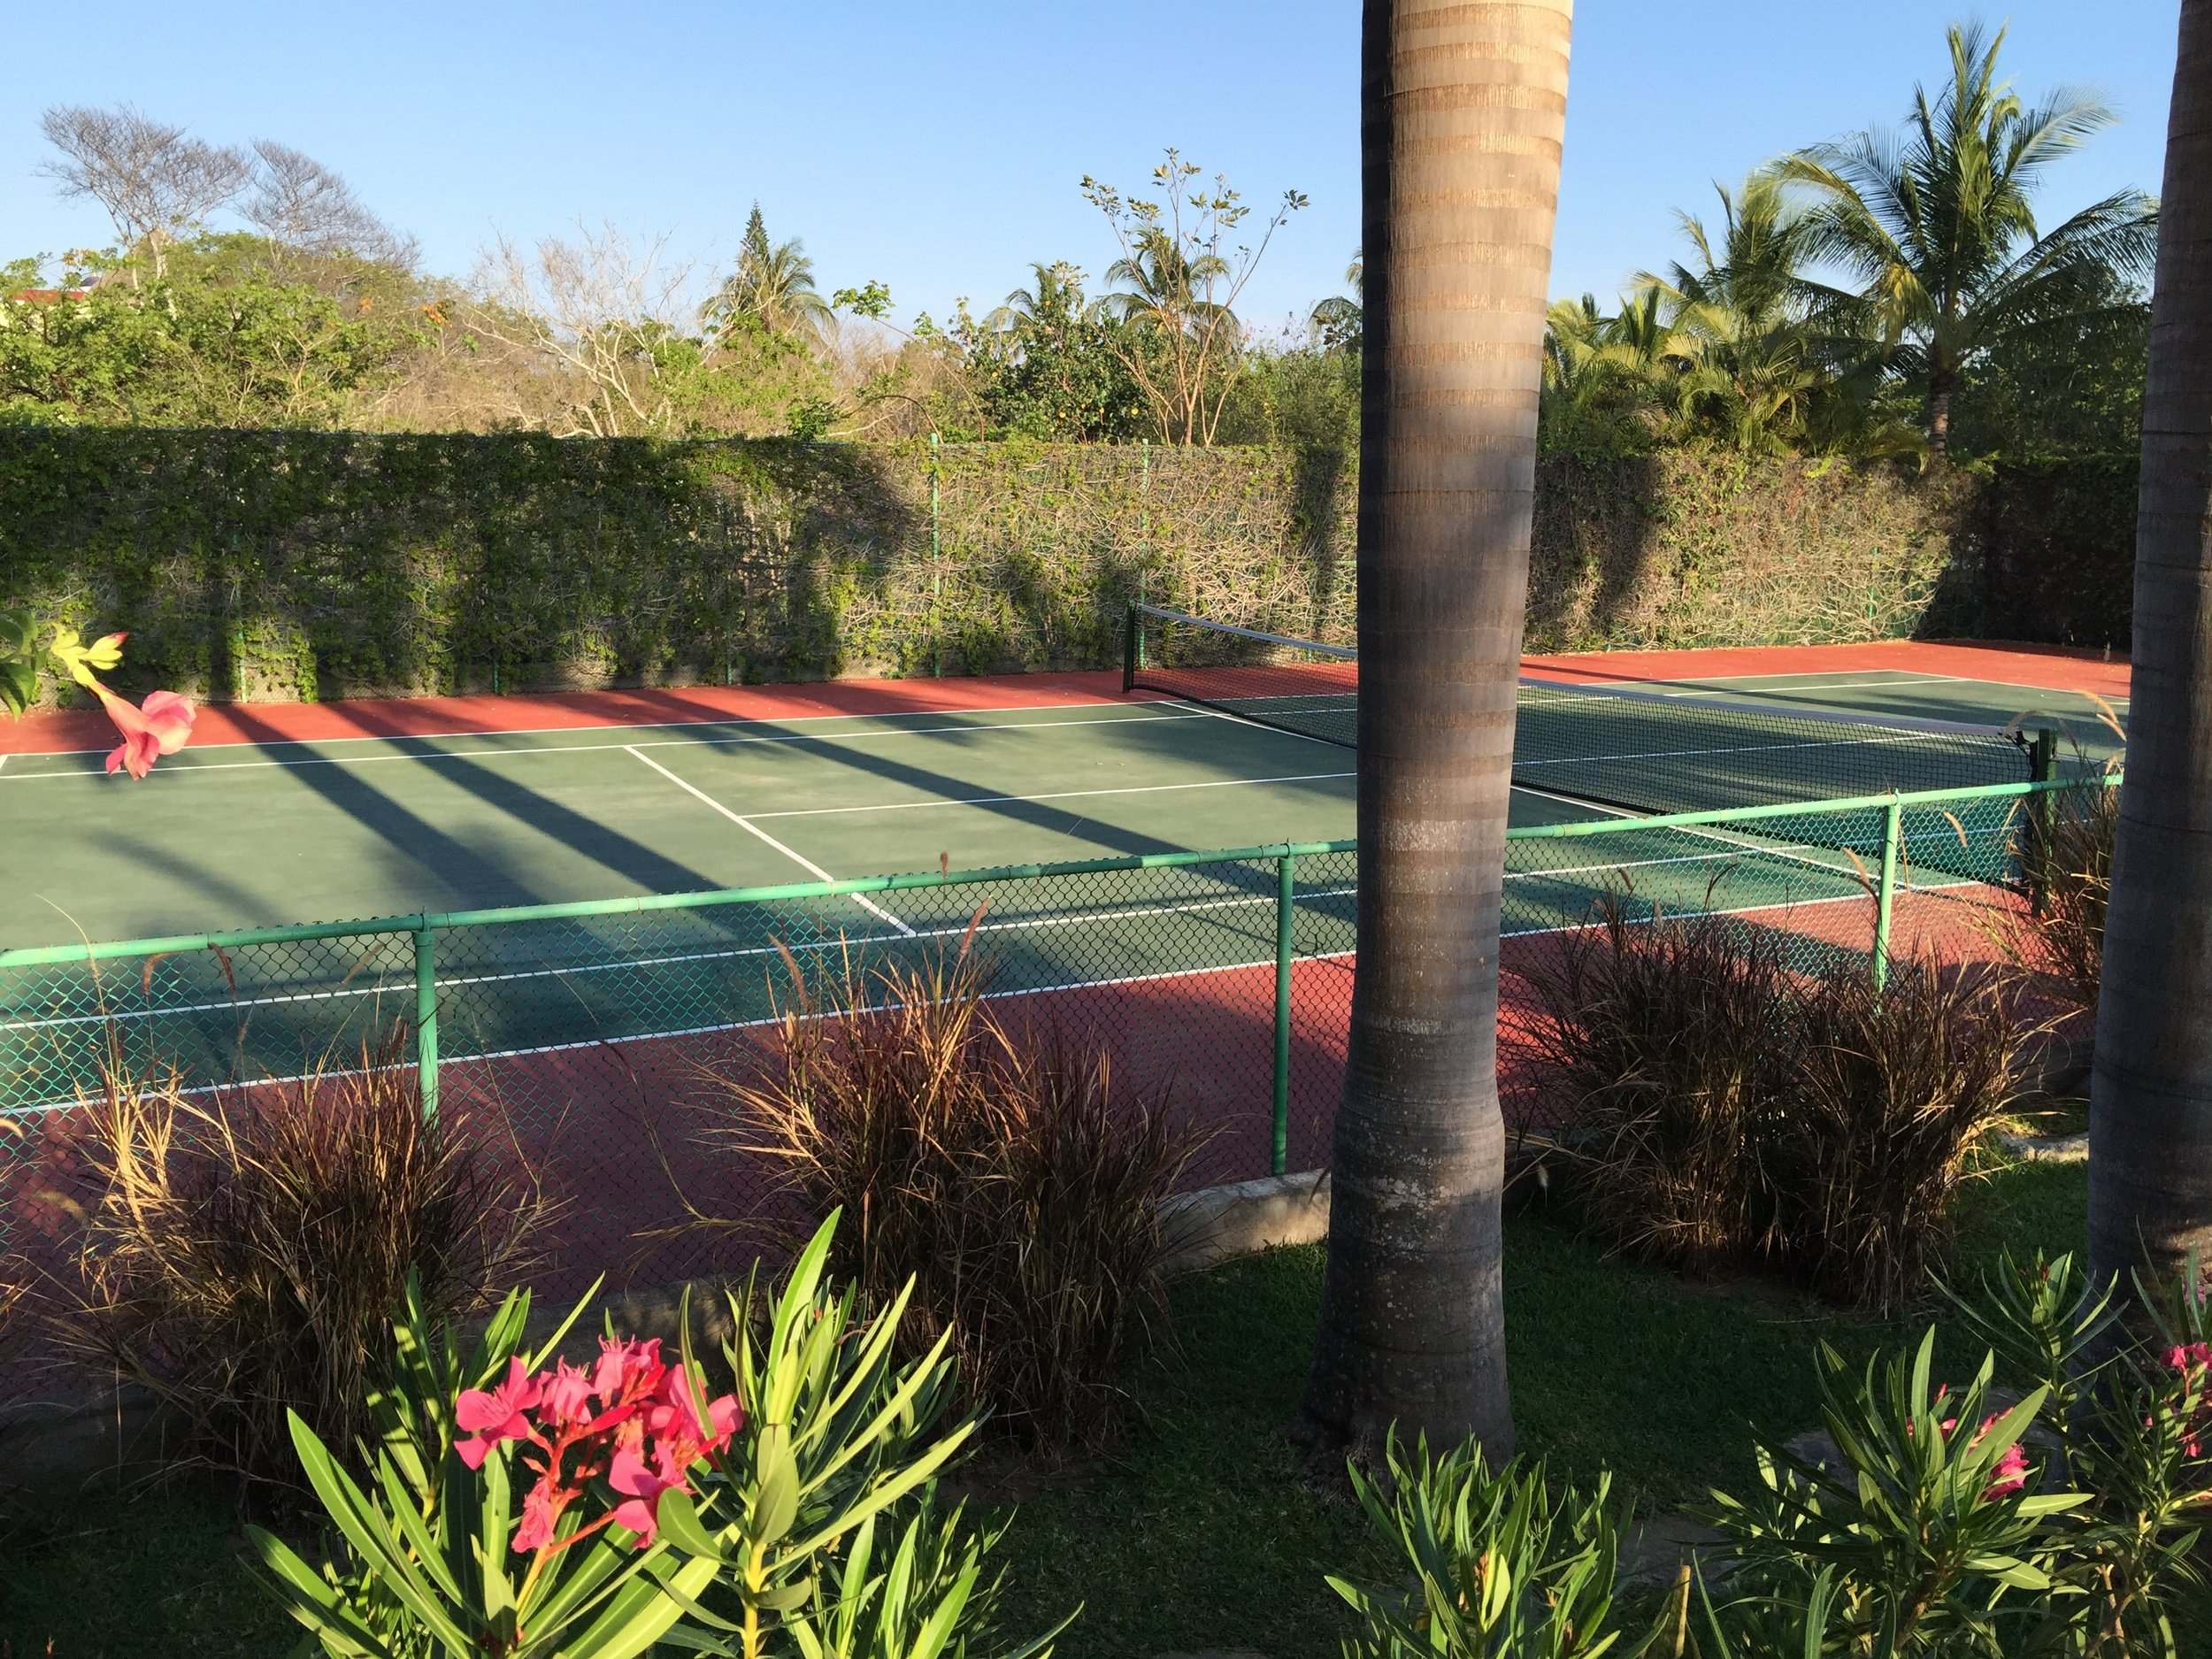 Full size tennis court.